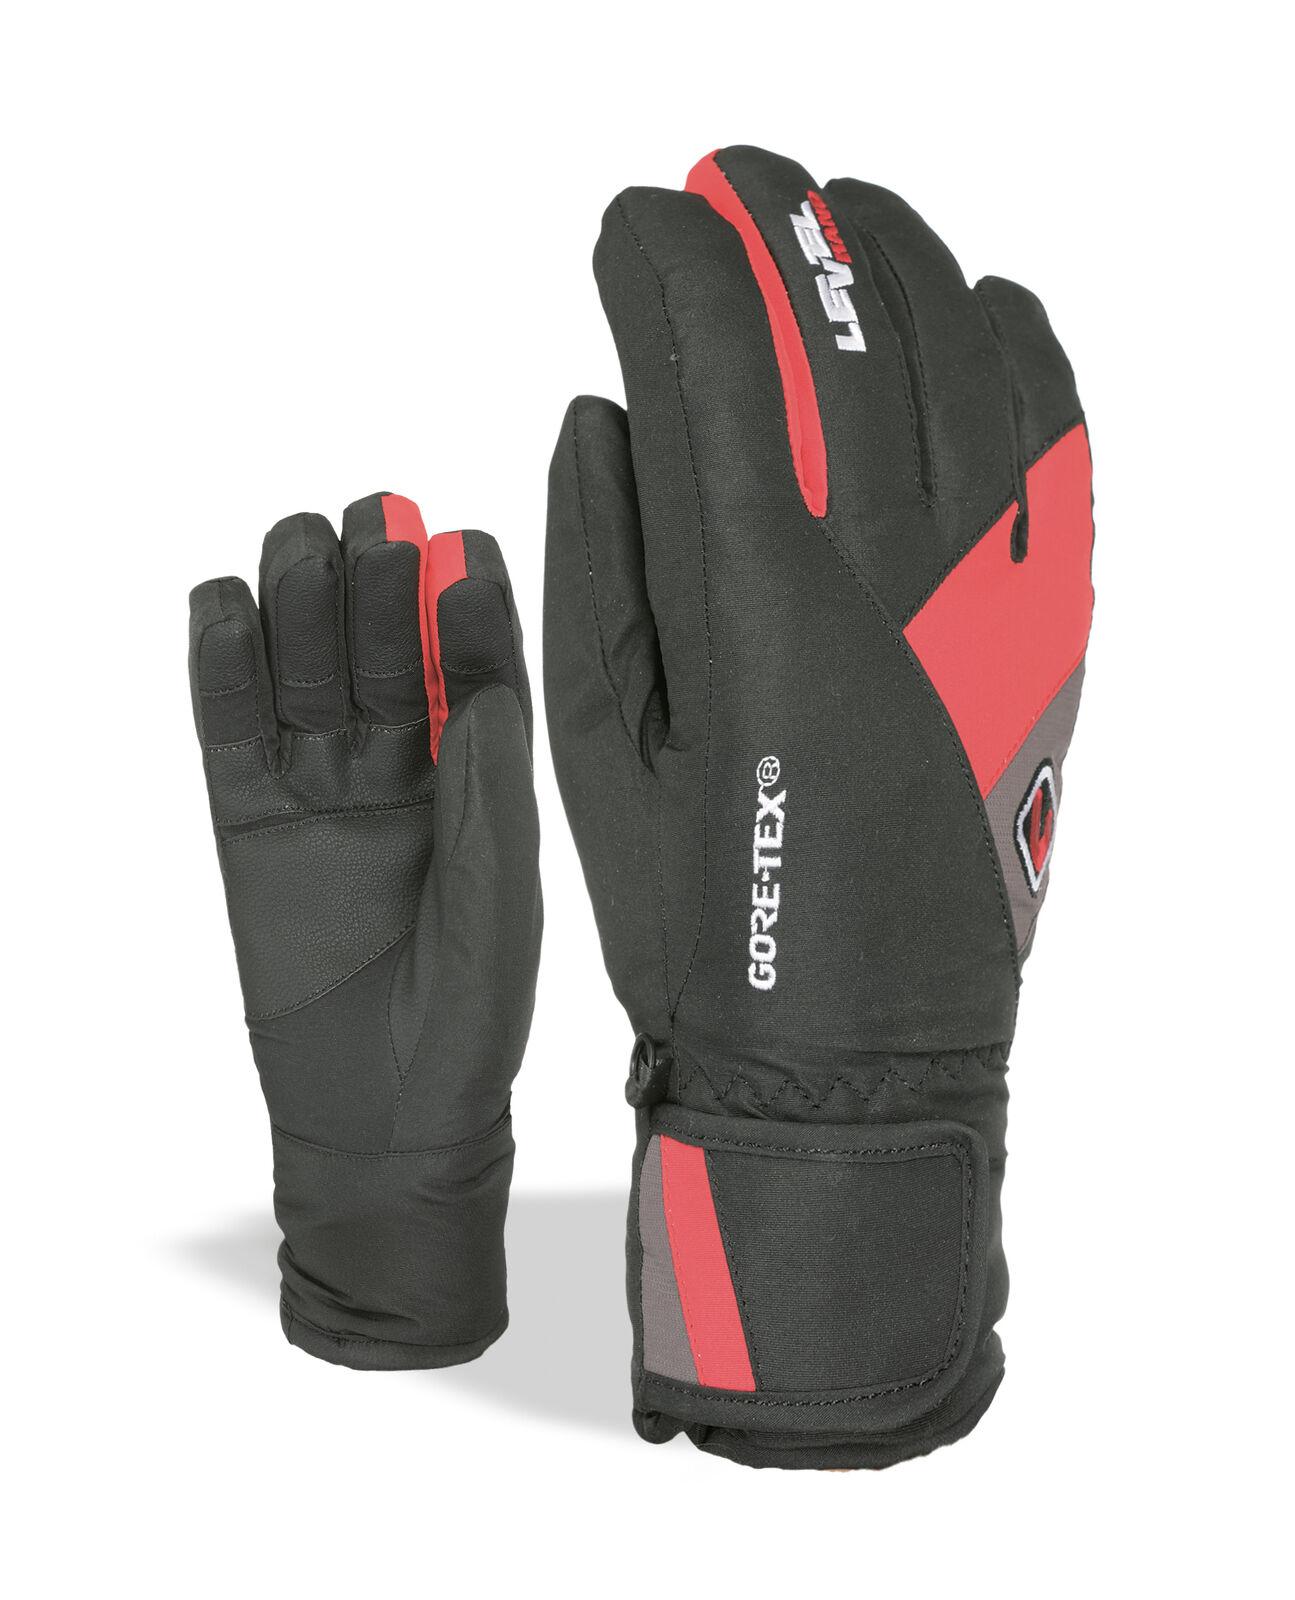 Level Handschuh  Force JR Gore-Tex black winddicht wasserdicht  will make you satisfied